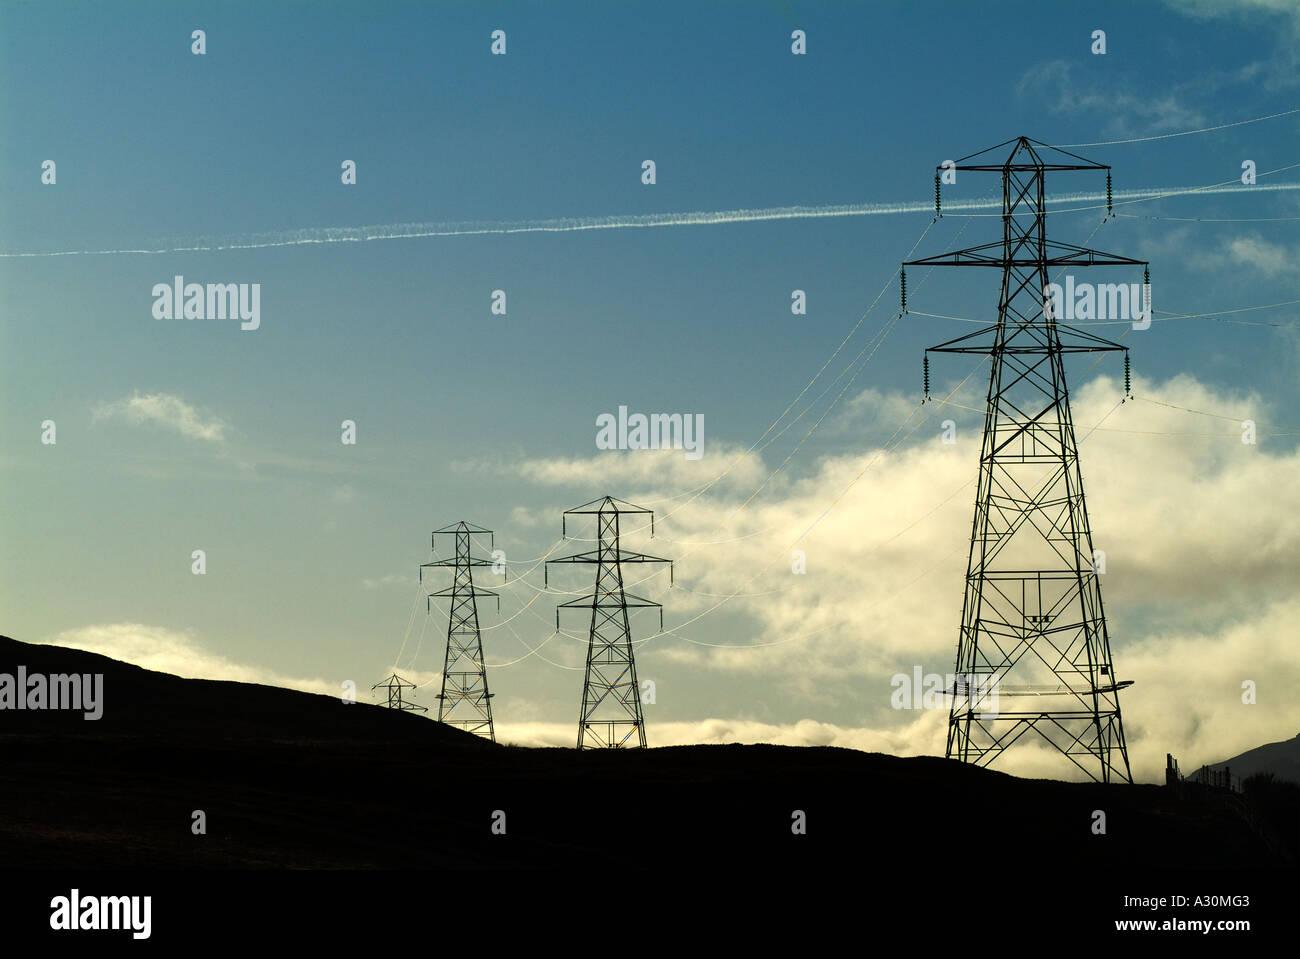 Electricity Pylons, A9 Corridor nr Dalwhinnie, Scottish Highlands, Scotland, UK - Stock Image